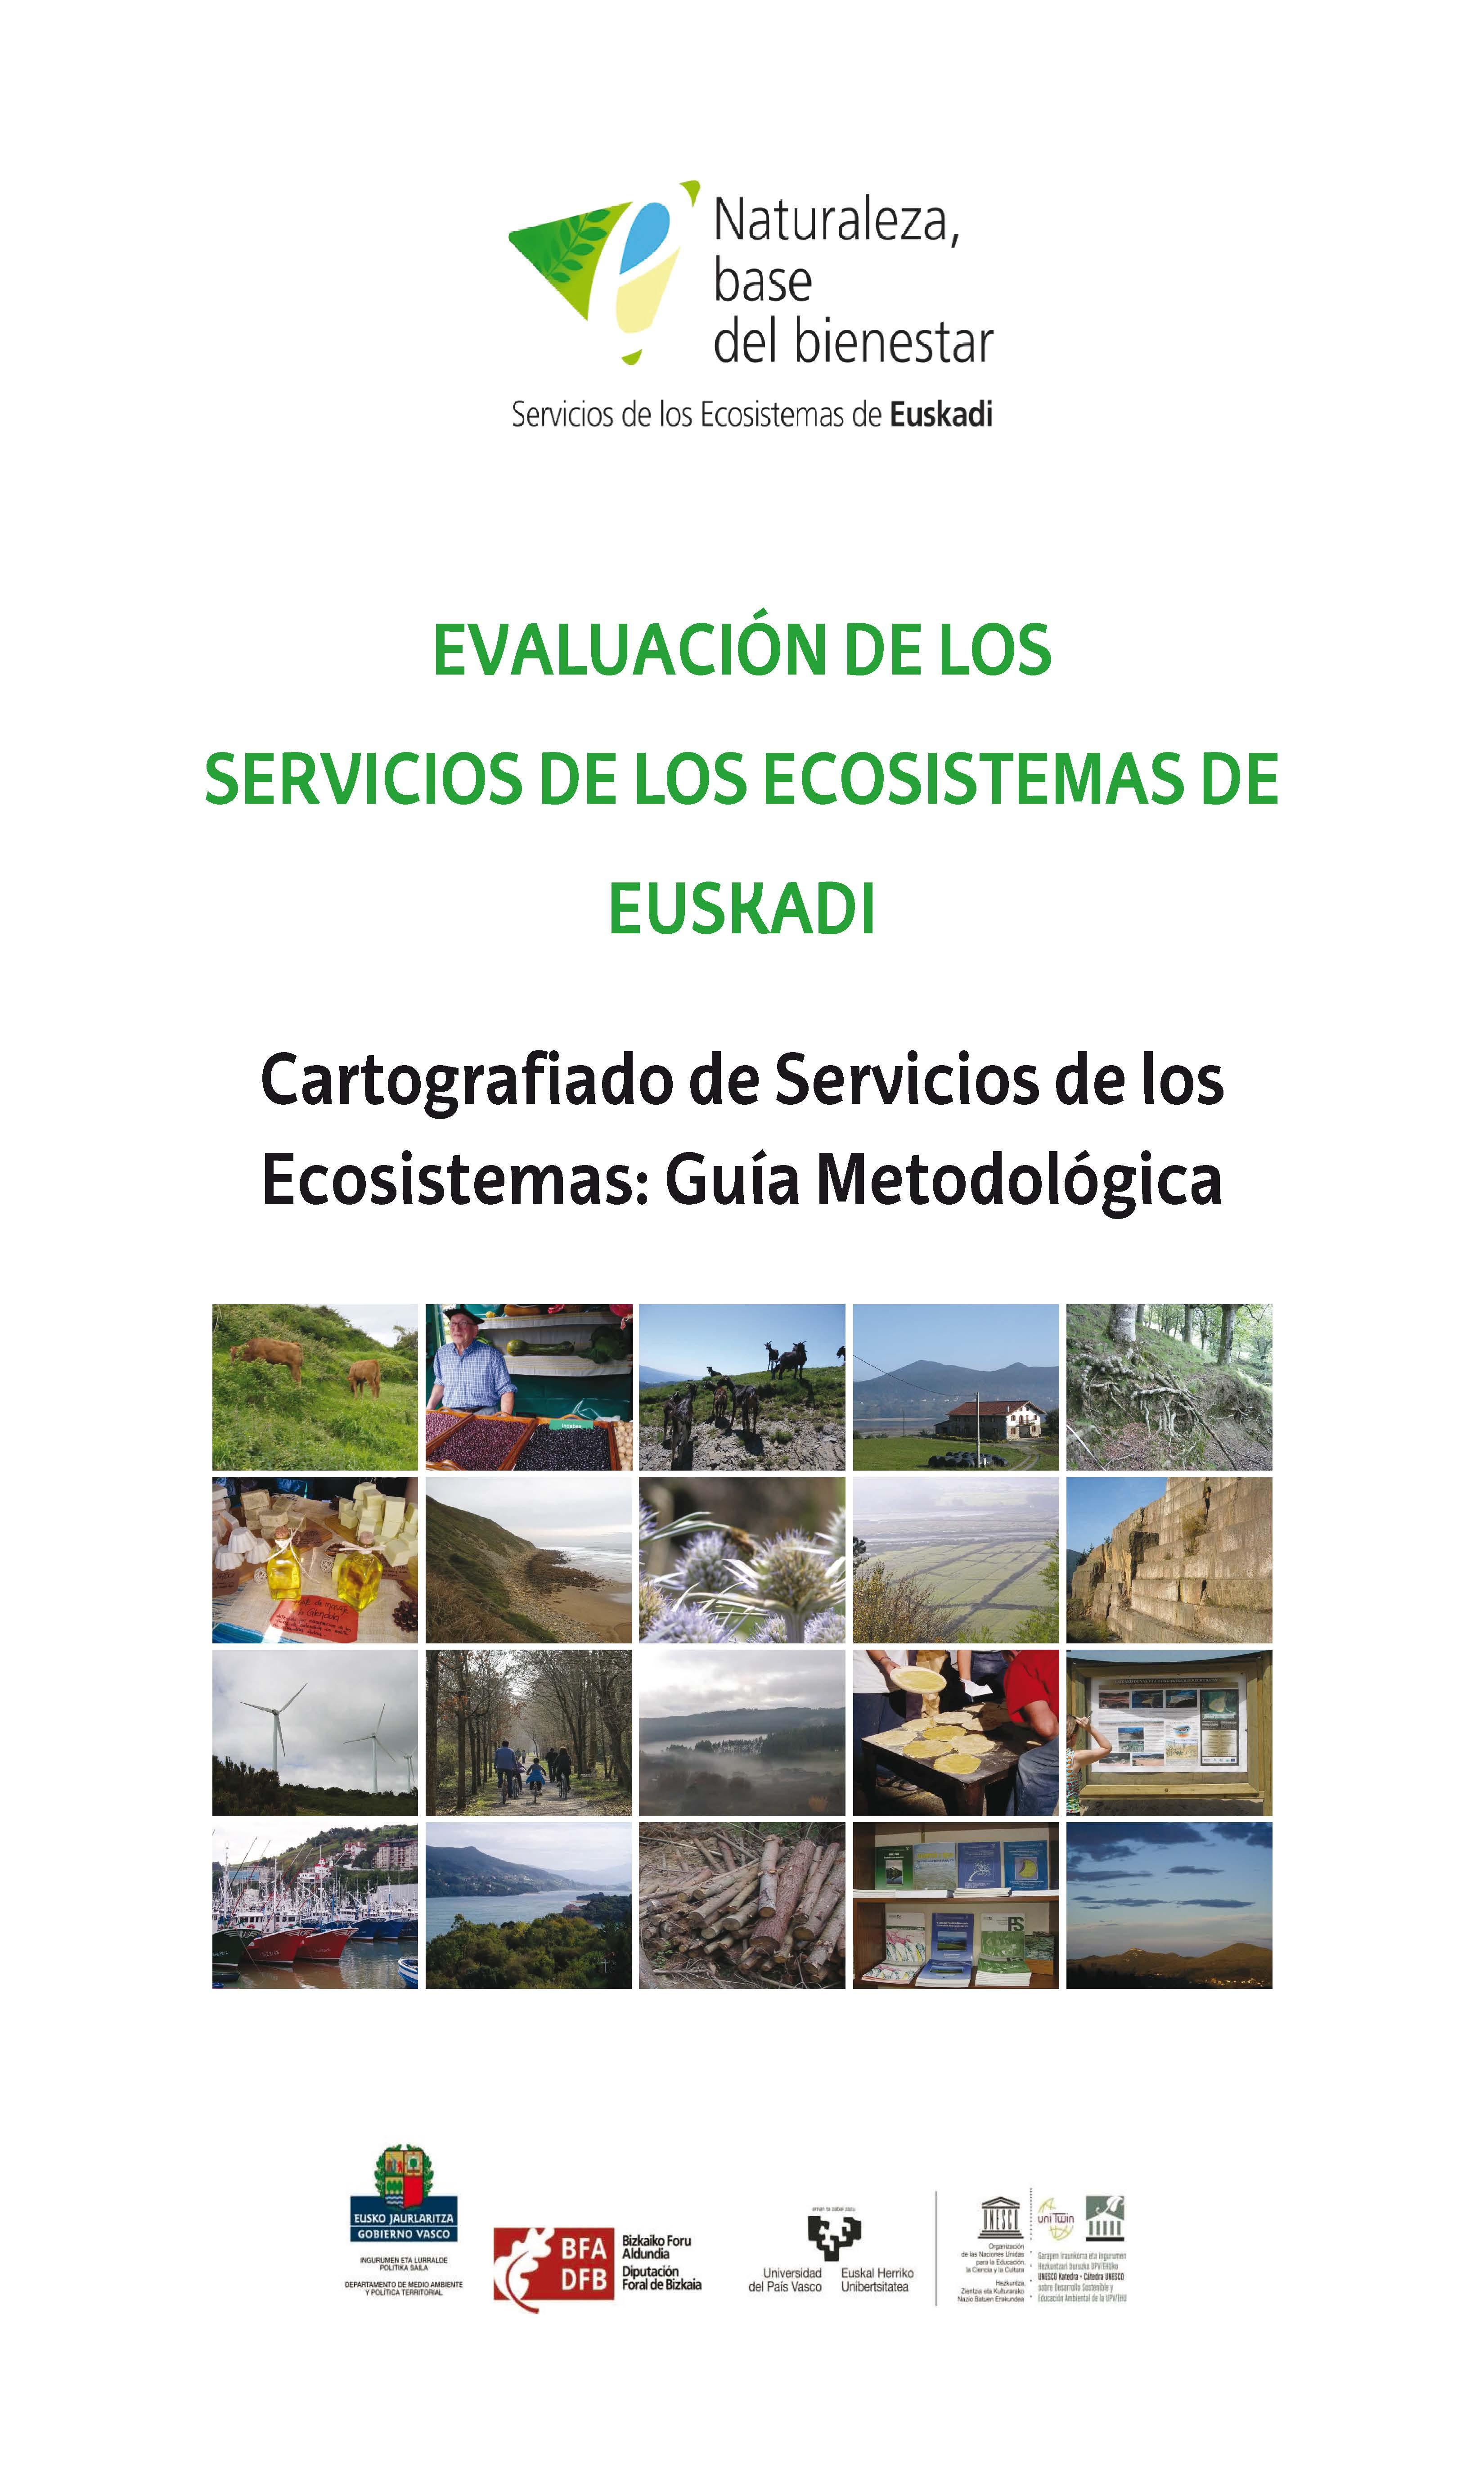 cartografia_servicios_ecosistemas.jpg